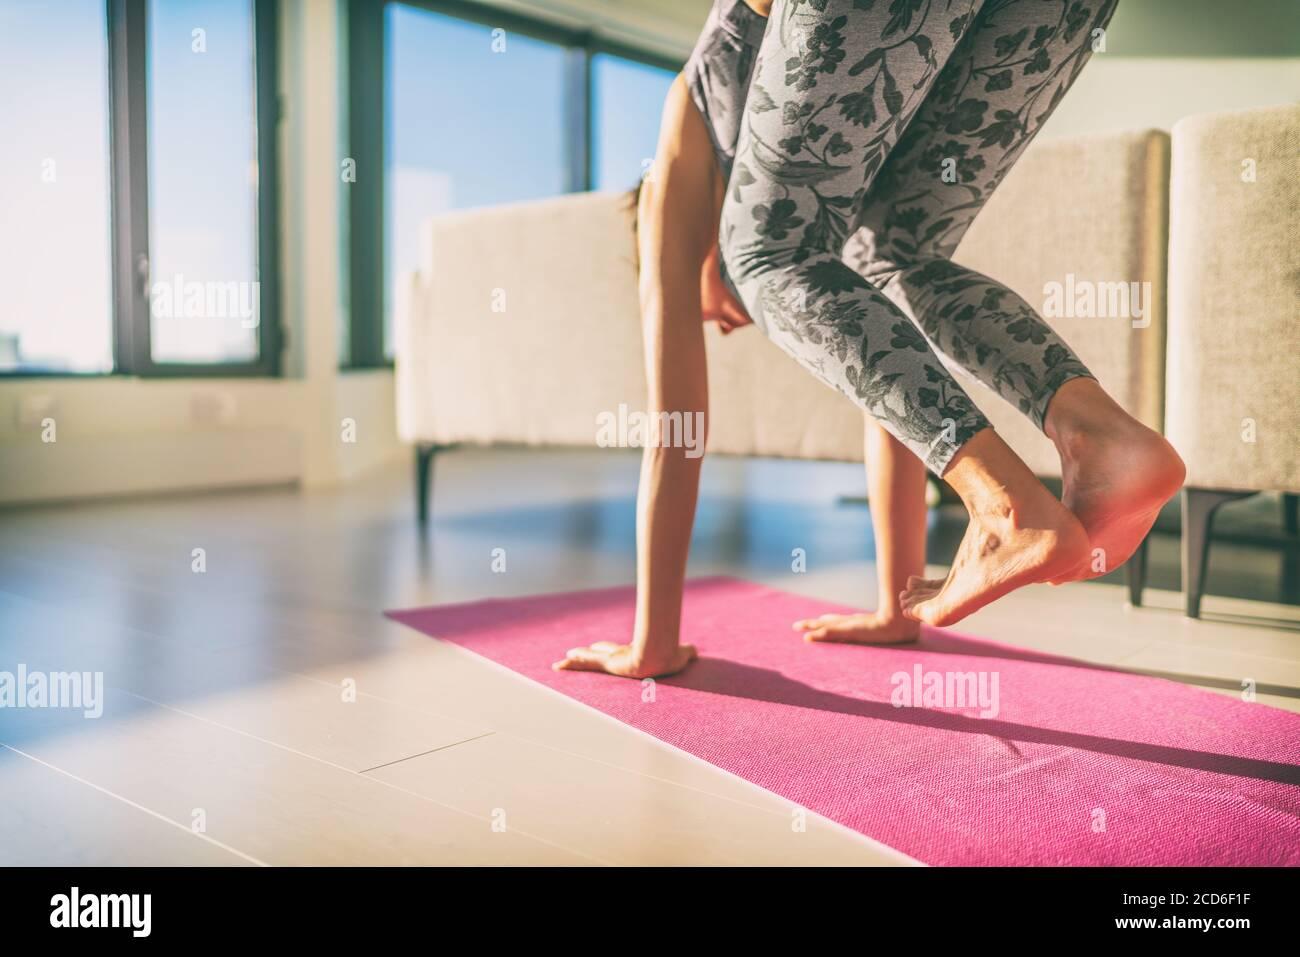 Yoga Girl Feet High Resolution Stock Photography and Images   Alamy